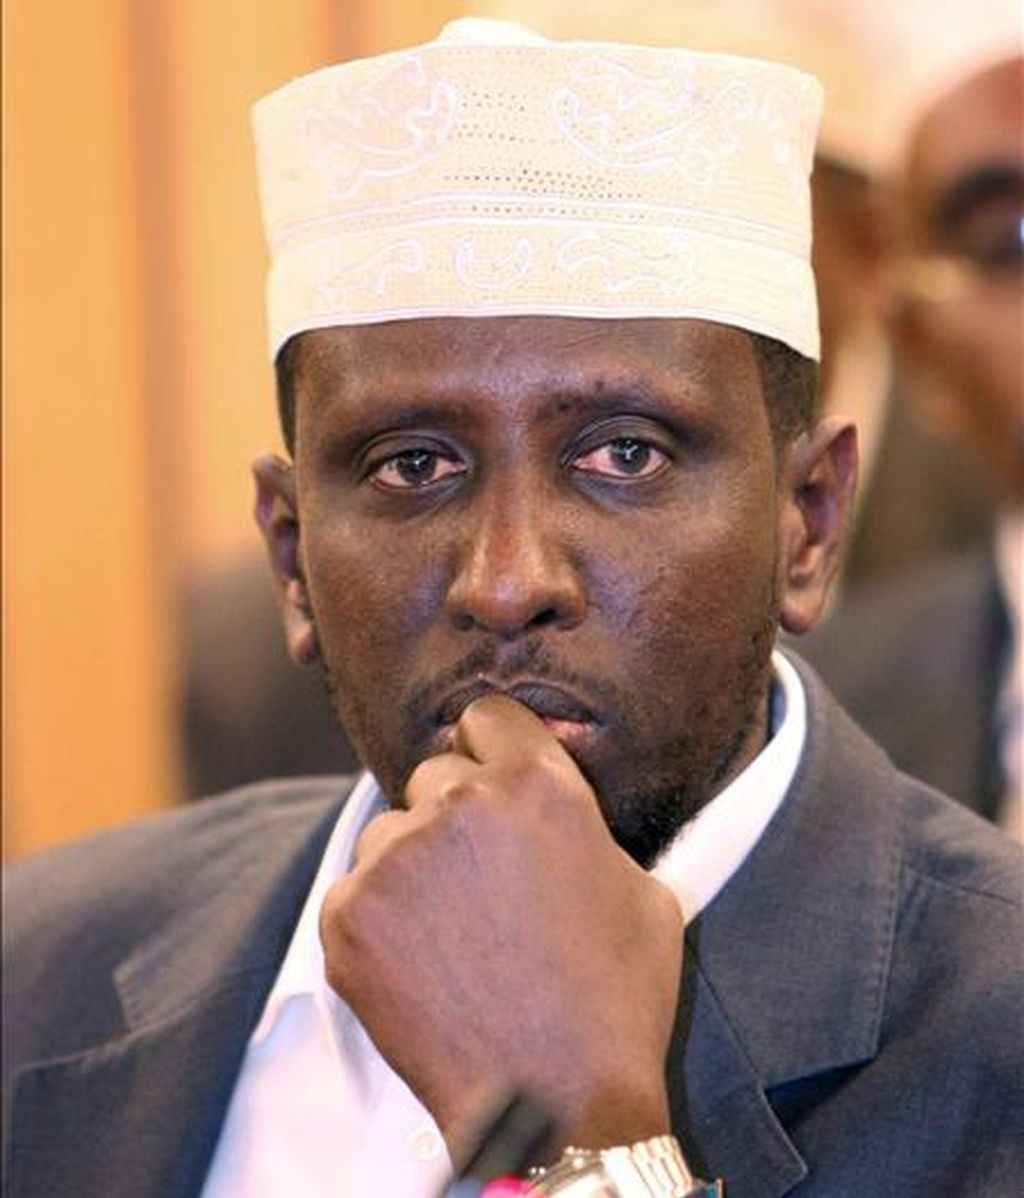 El presidente somalí, Sharif Sheikh Ahmed. EFE/Archivo